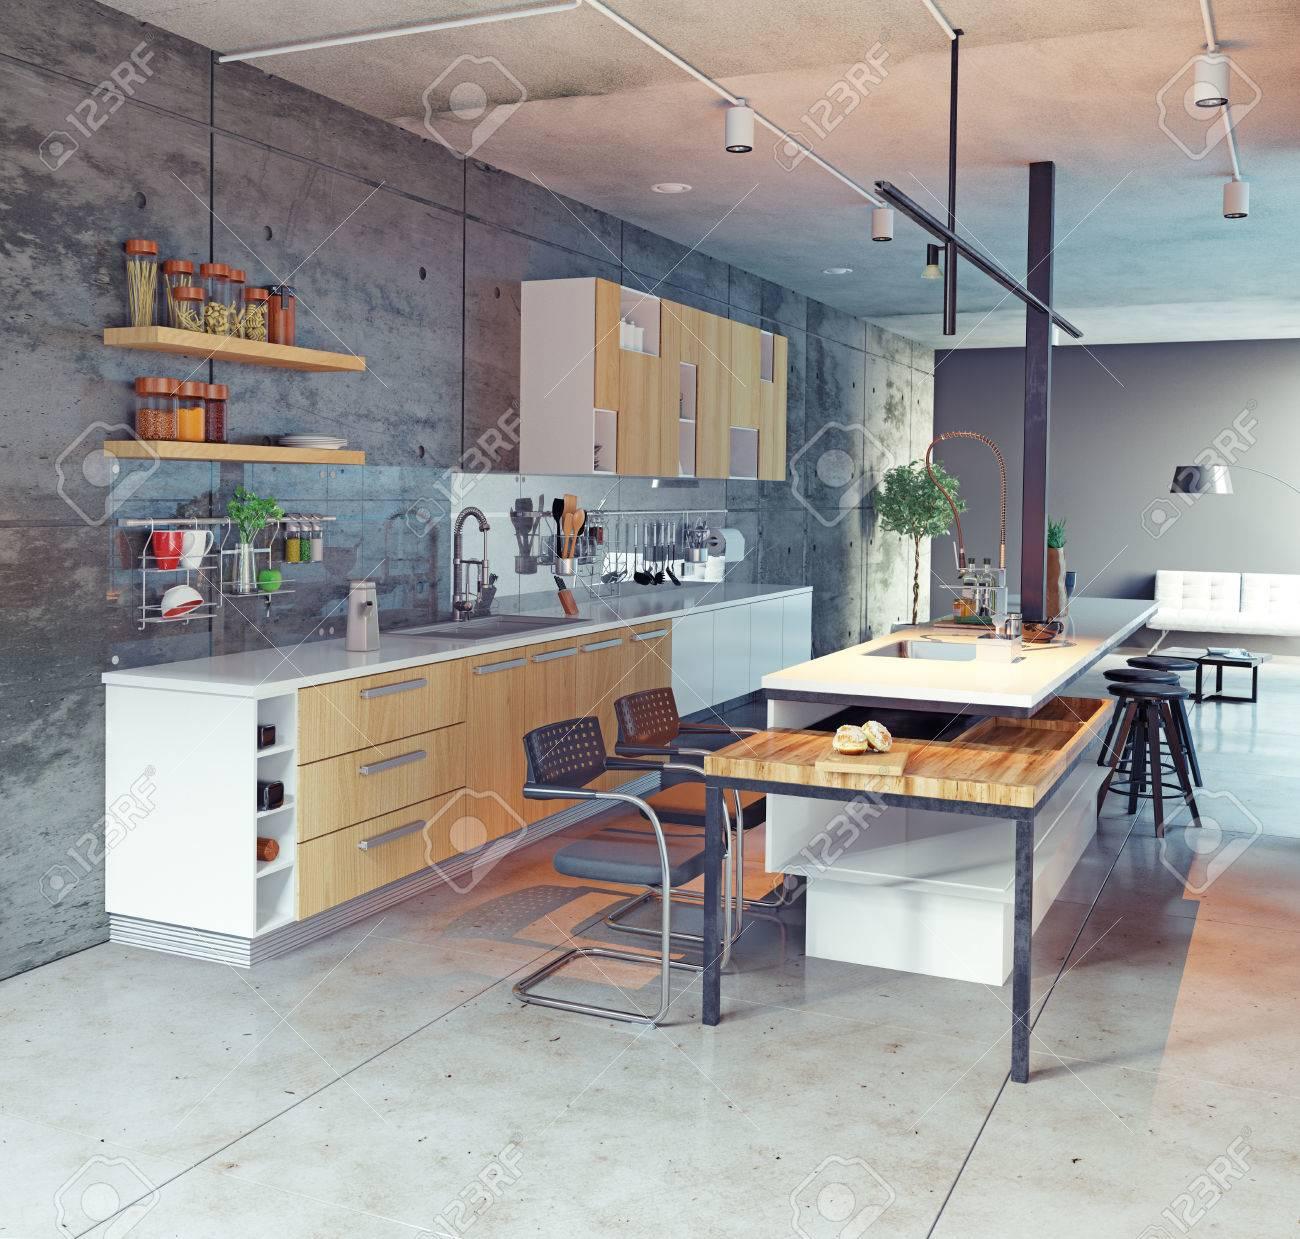 Cocina Moderna Del Diseño Interior. Concepto 3d Fotos, Retratos ...